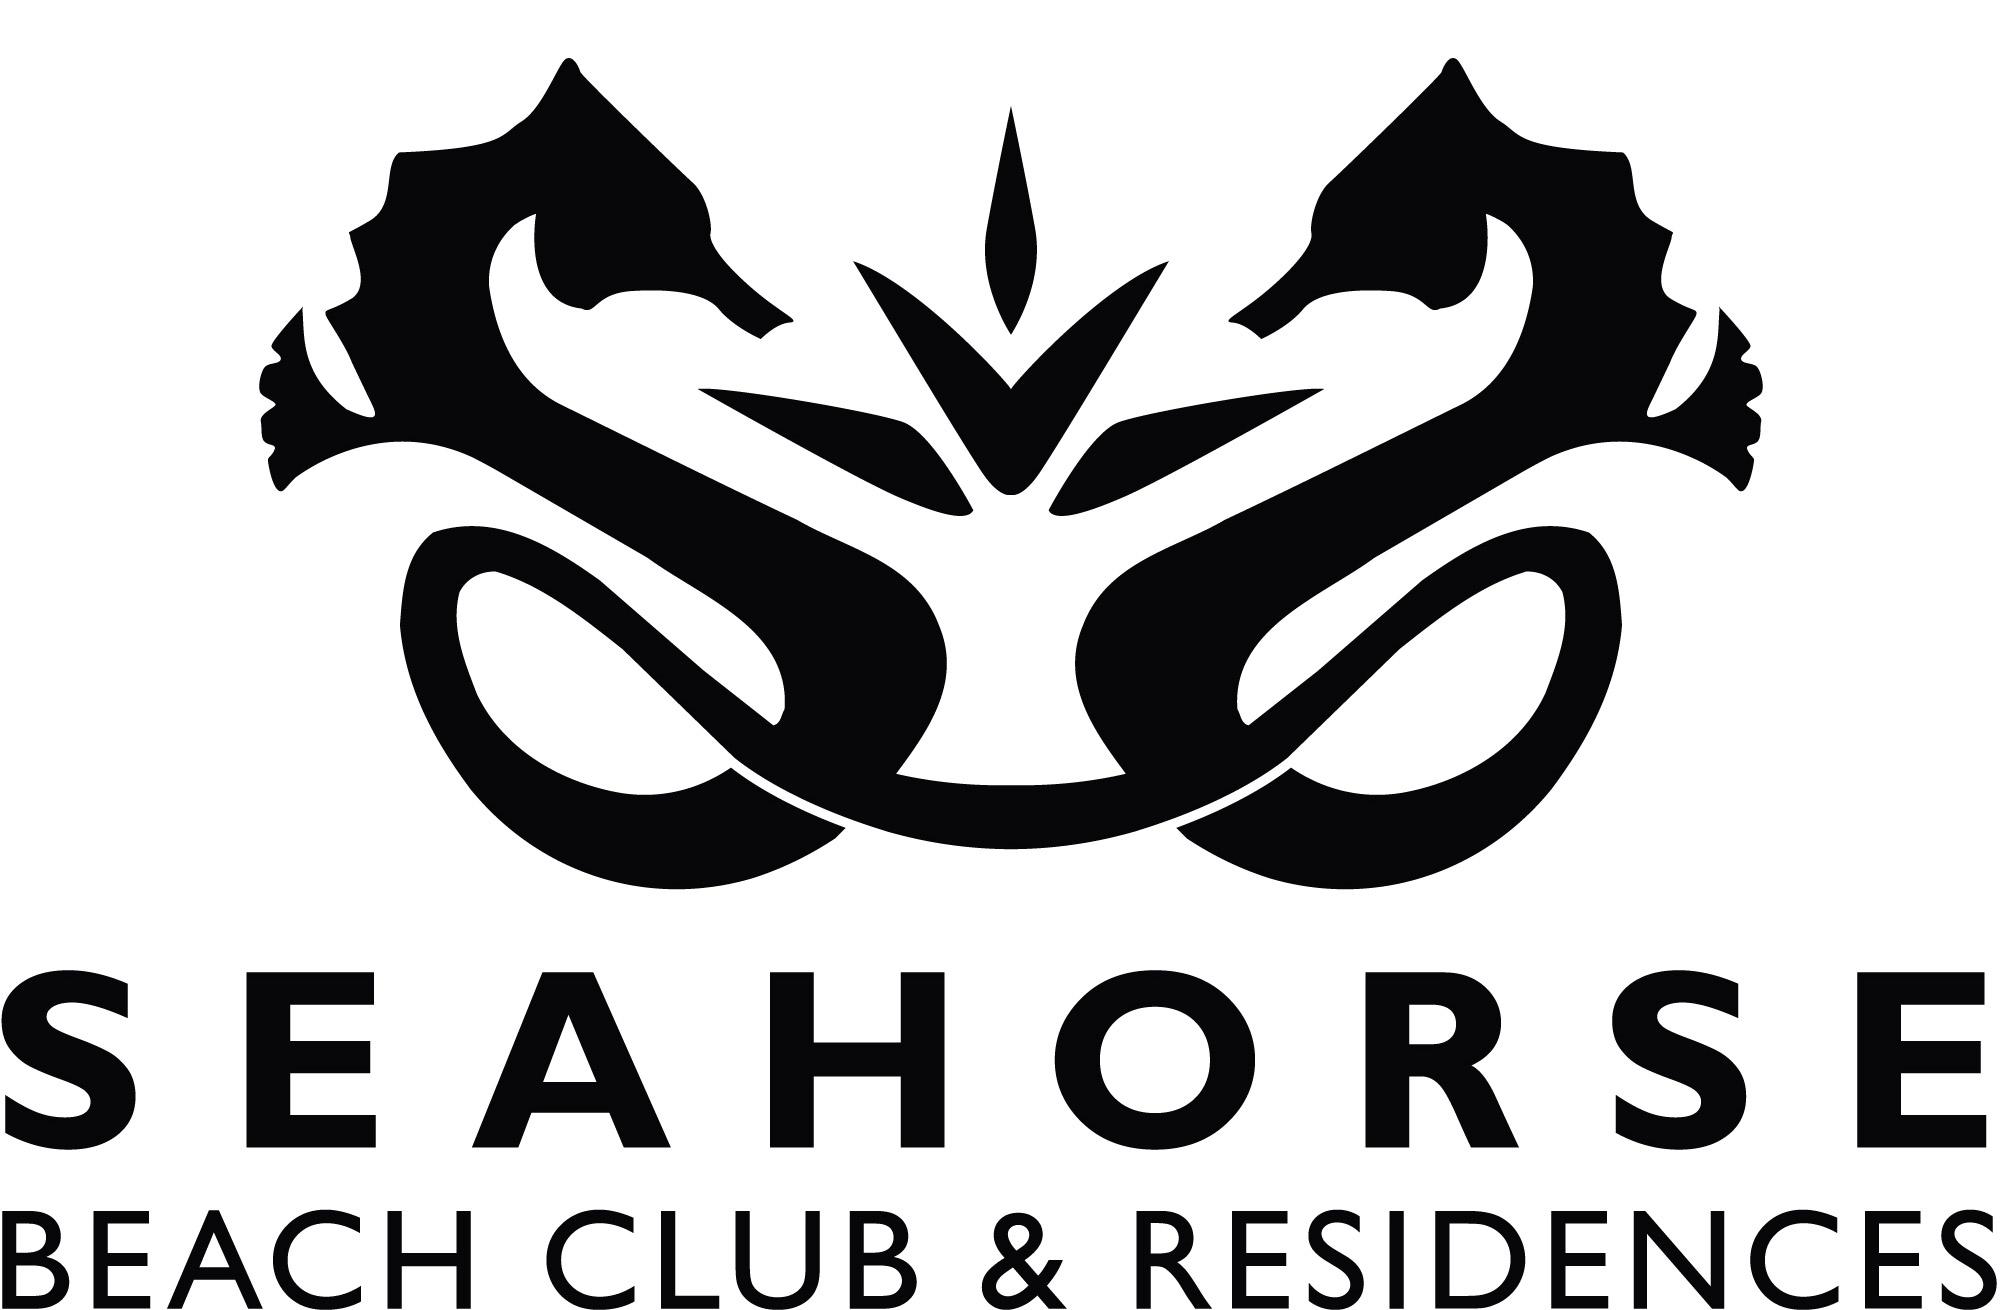 New Beach-House Resort, Seahorse Beach Club & Residences